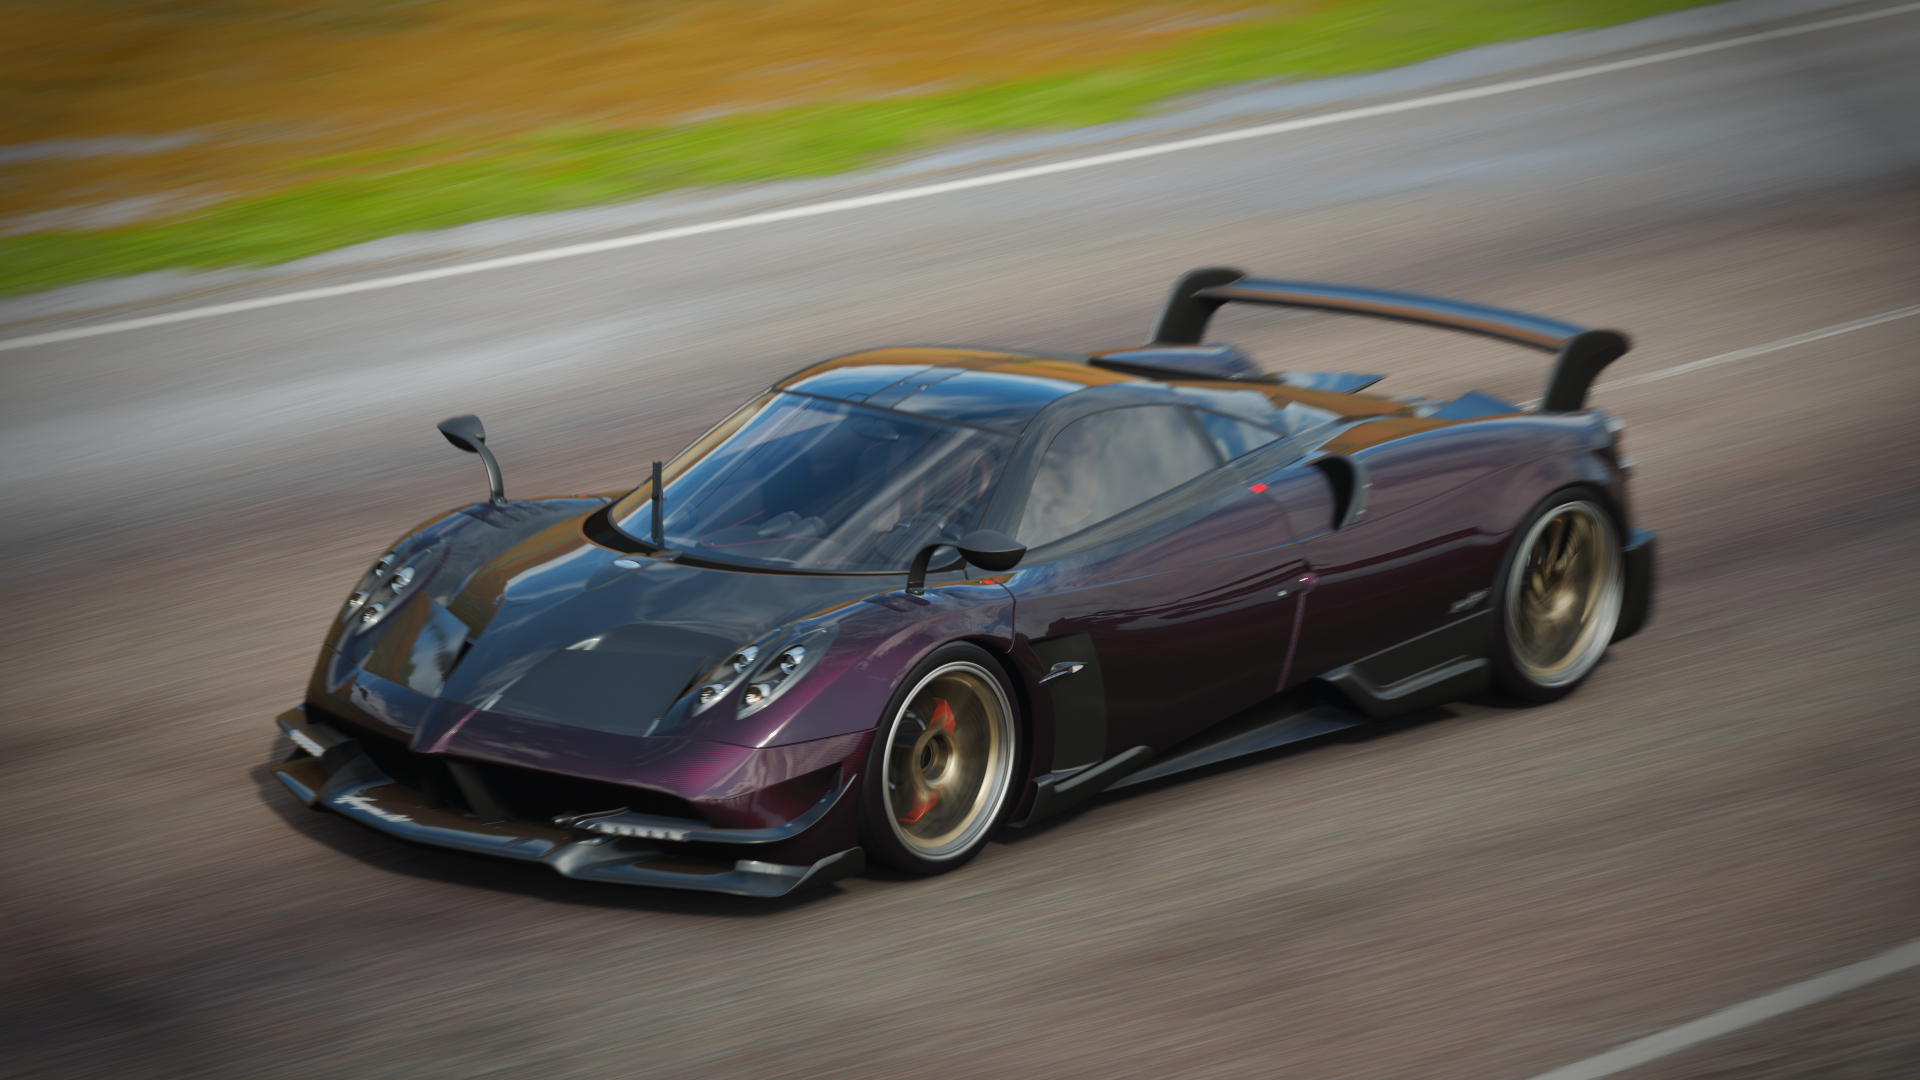 General 1920x1080 Forza Forza Horizon 4 Forza Horizon car racing cinematic supercars Hypercar Ferrari Pagani Ford italdesign